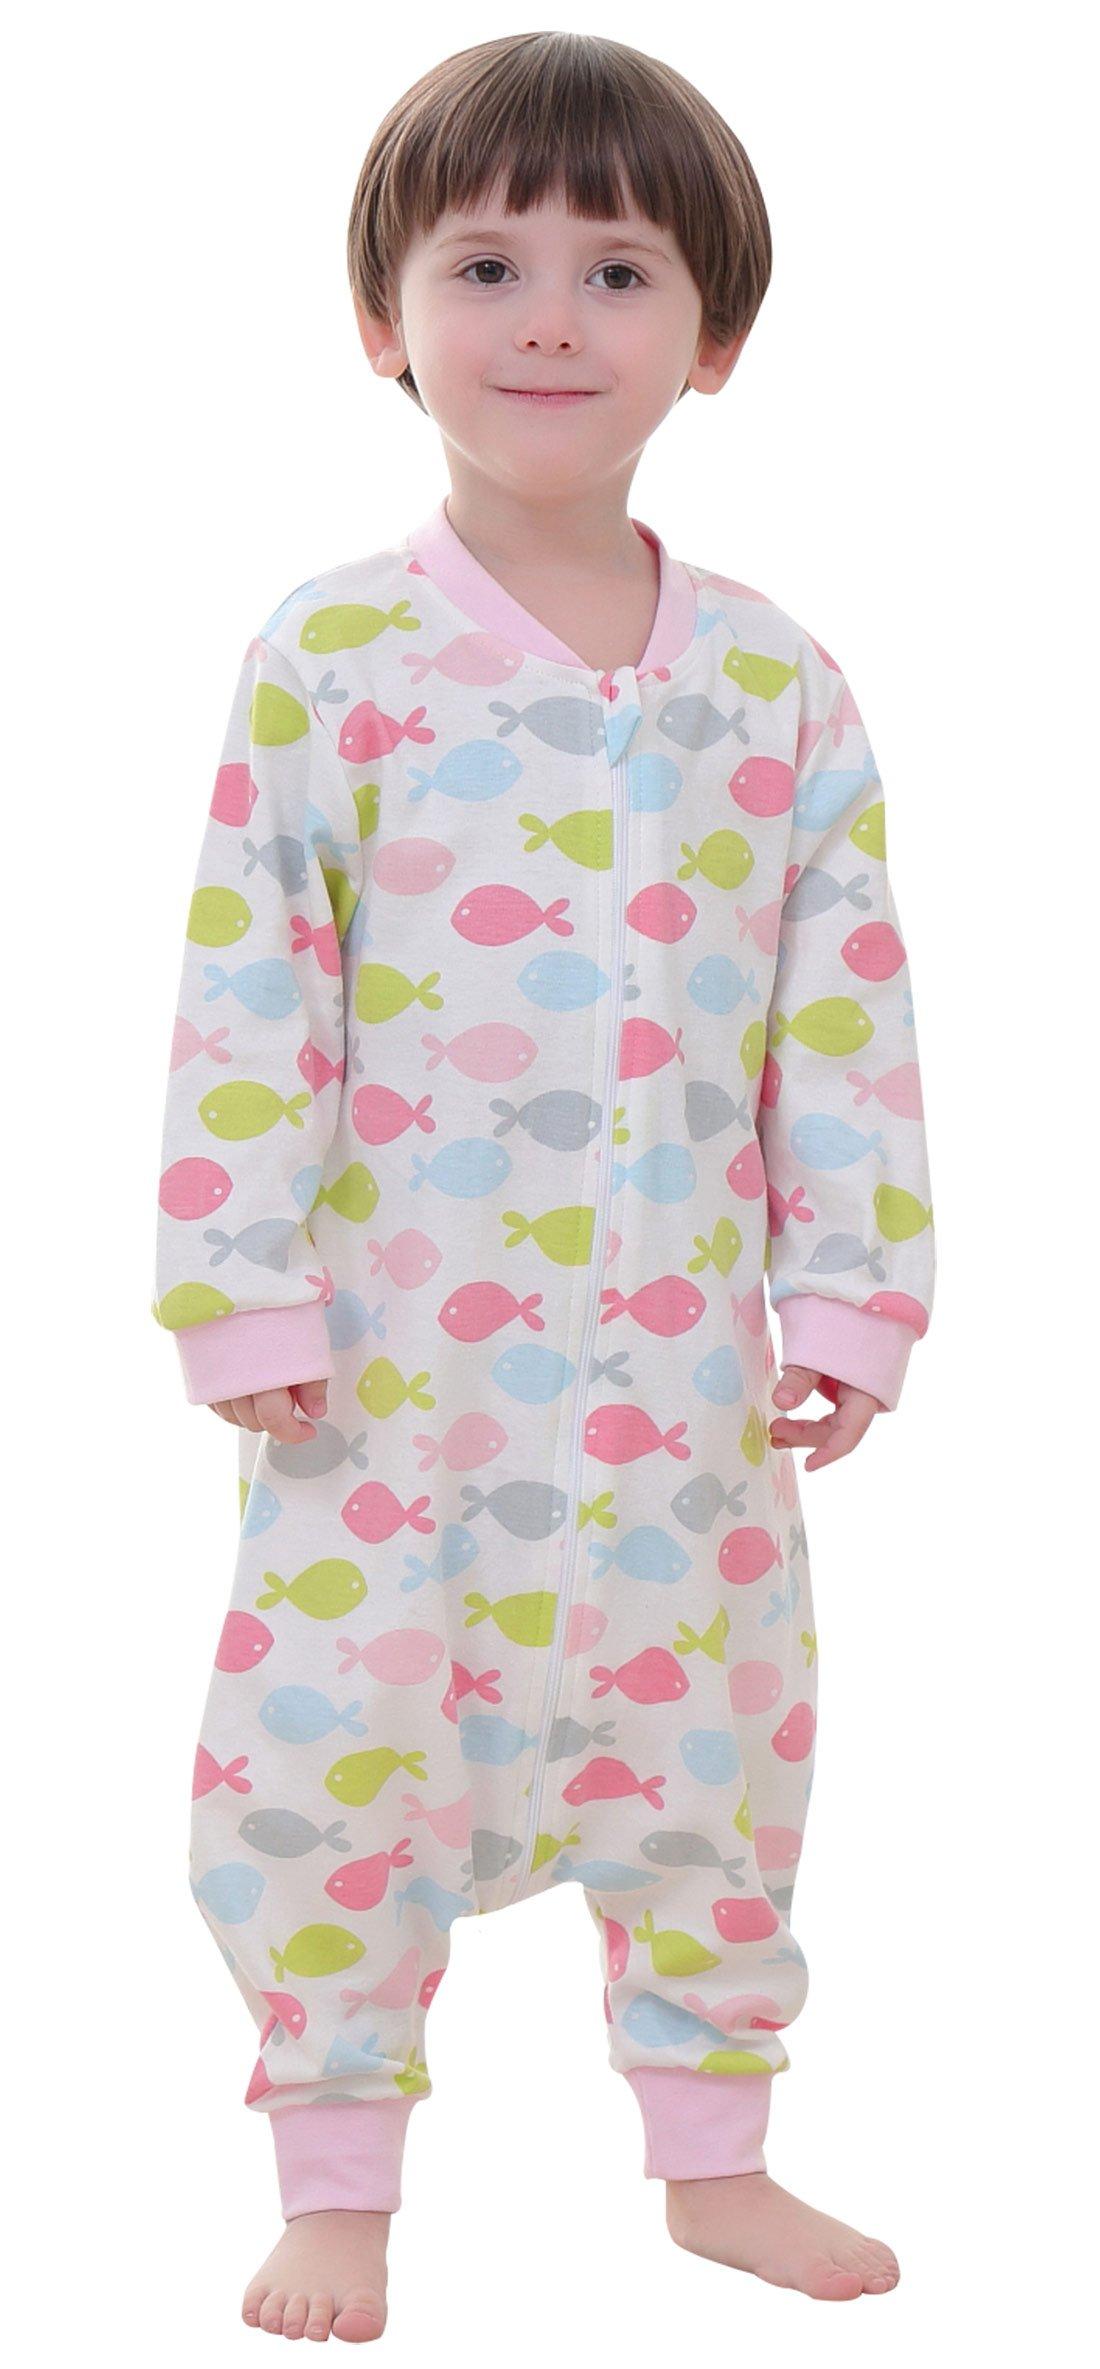 Toddler Baby Sleeping Bag Spring Summer Kids Sleepwear Organice Cotton Animal Sleep Bag Cute 1-2T L